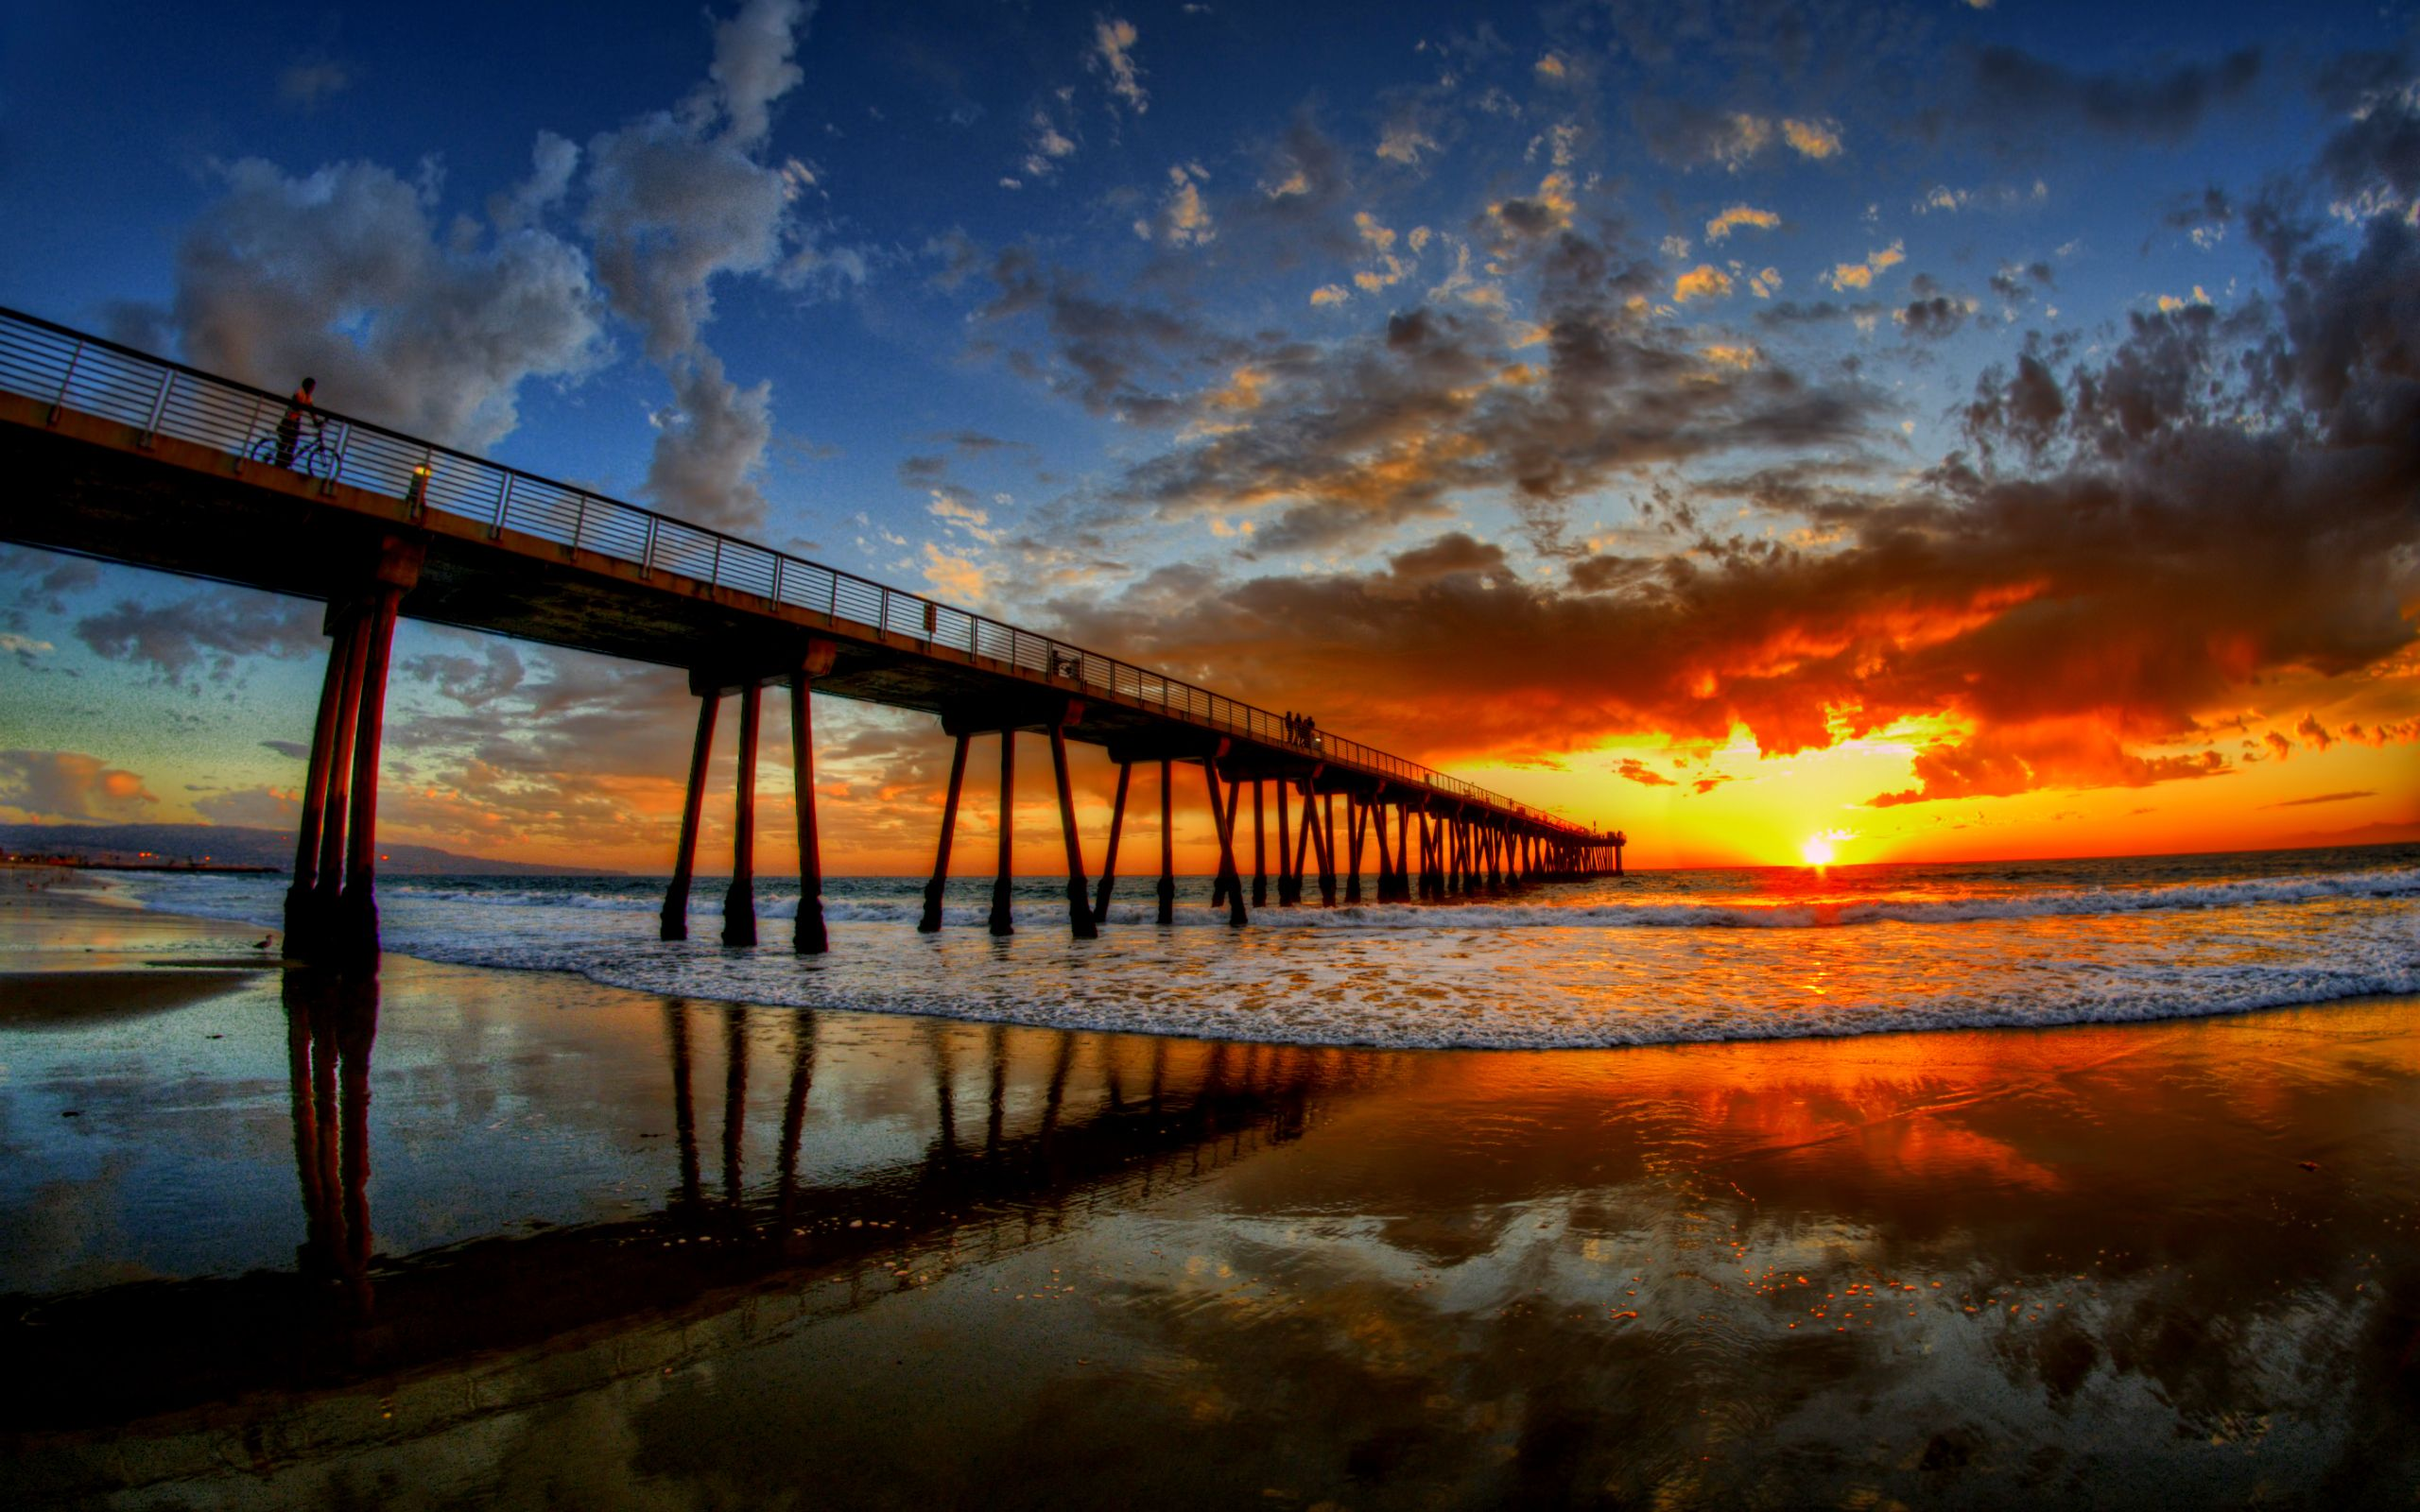 sunset hd wallpapers | wallpapers | pinterest | beautiful sunset